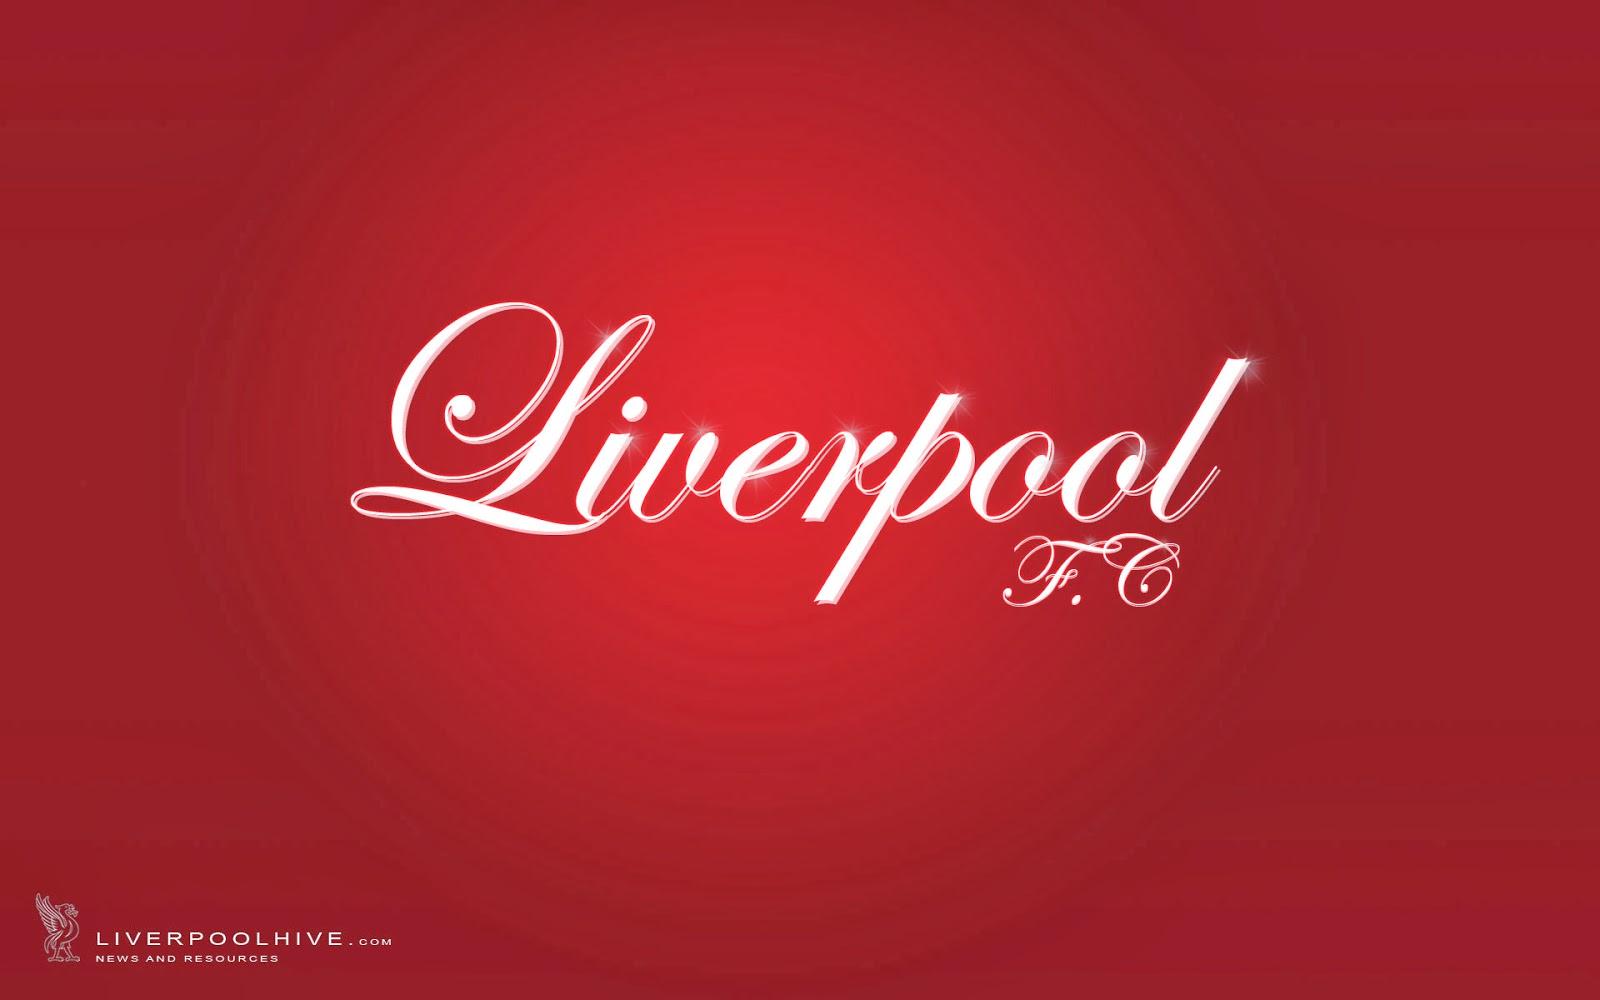 Liverpool Fc Logo Hd 2014